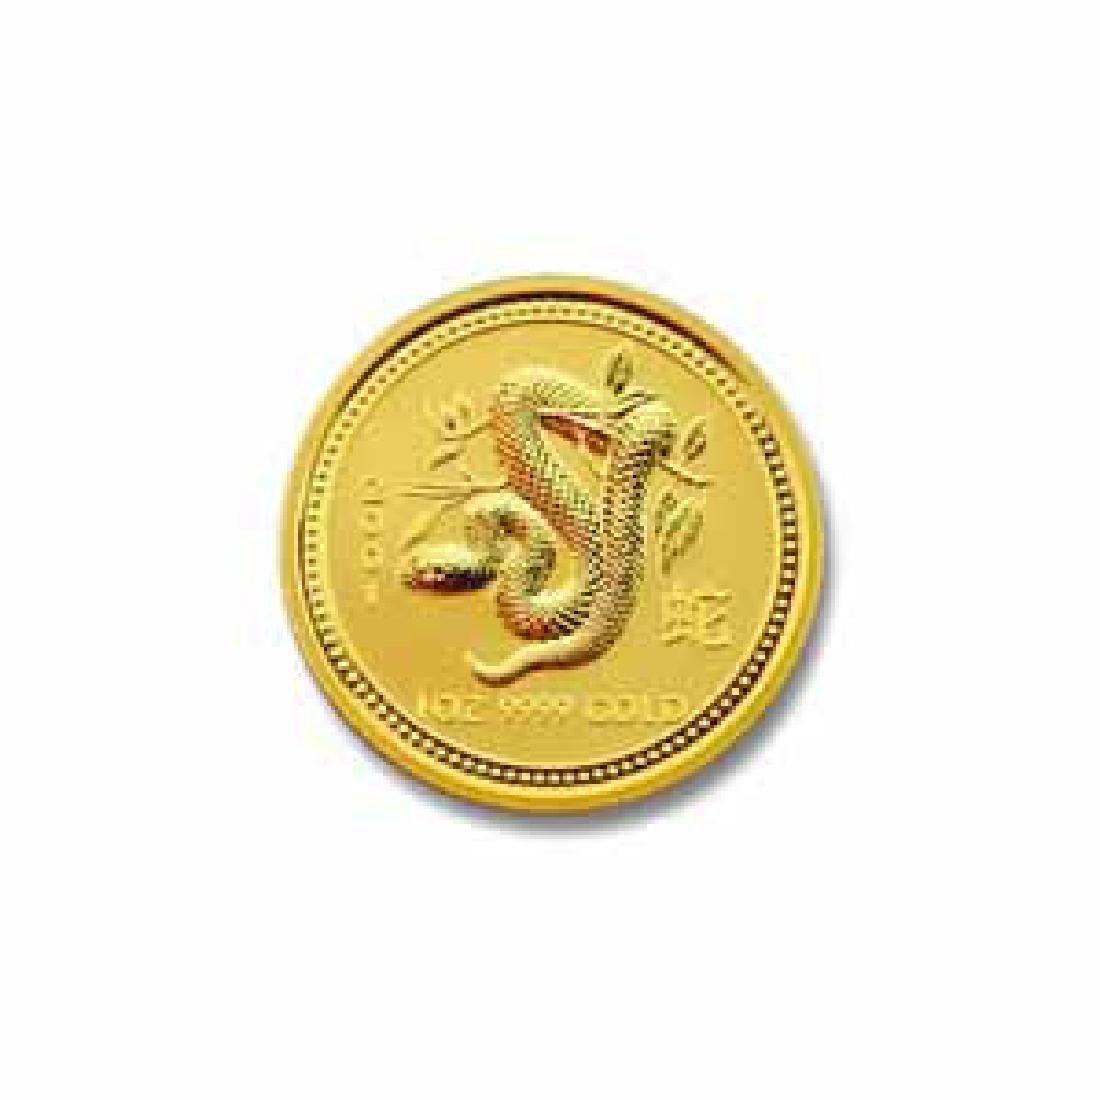 2001 Australia 1/10 oz Gold Lunar Snake